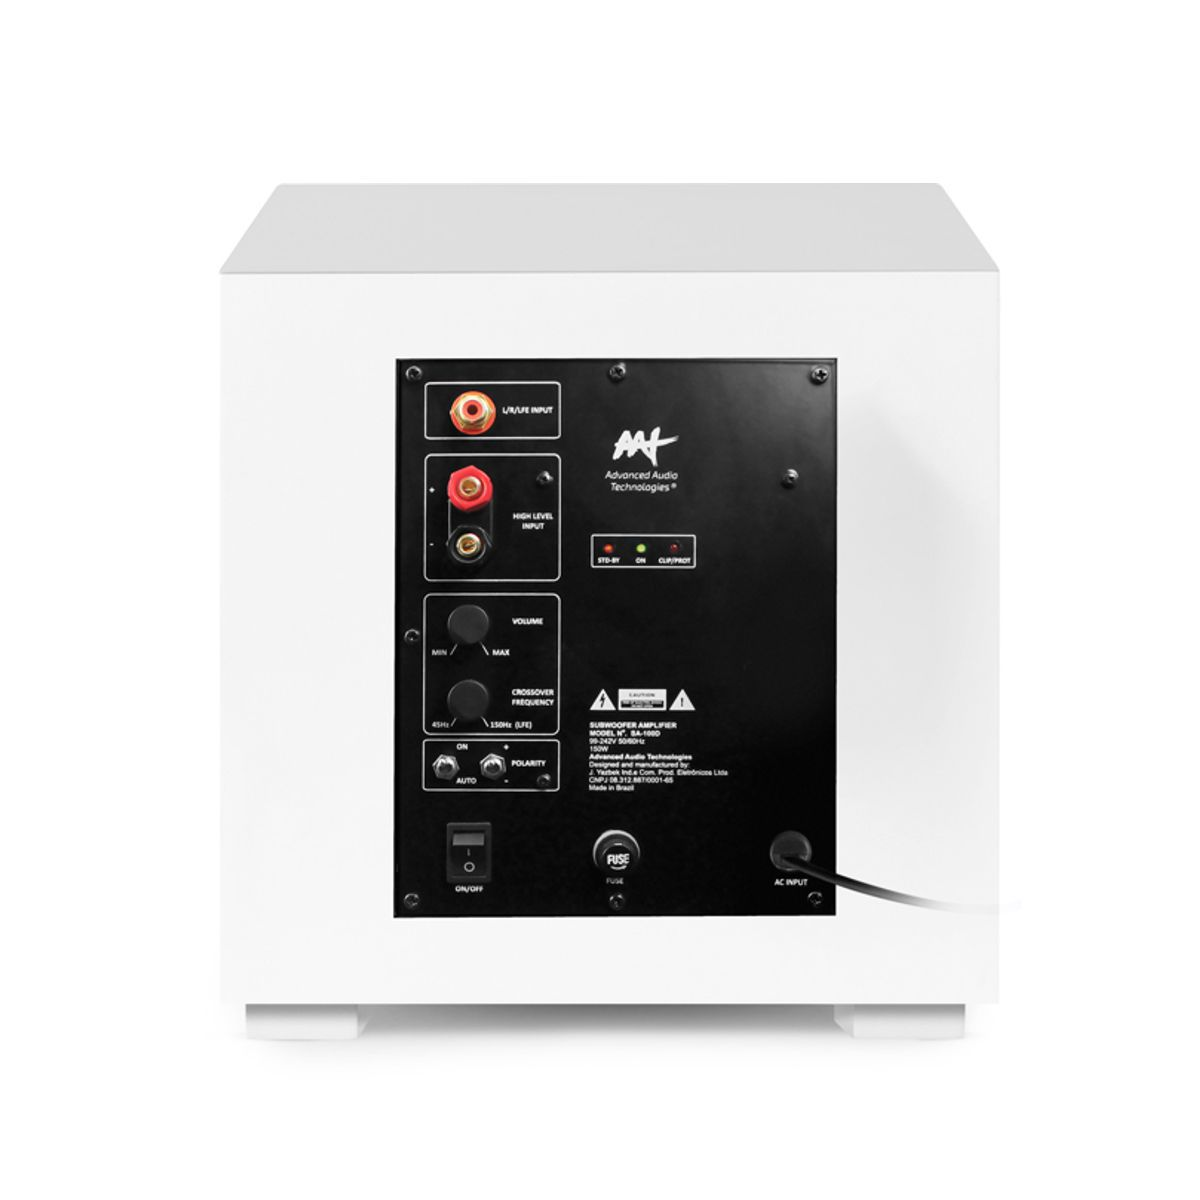 "Kit 5.1 Caixa de Embutir no Gesso LCR-A100 + LR-E100 + Subwoofer Compact Cube 8"" AAT"